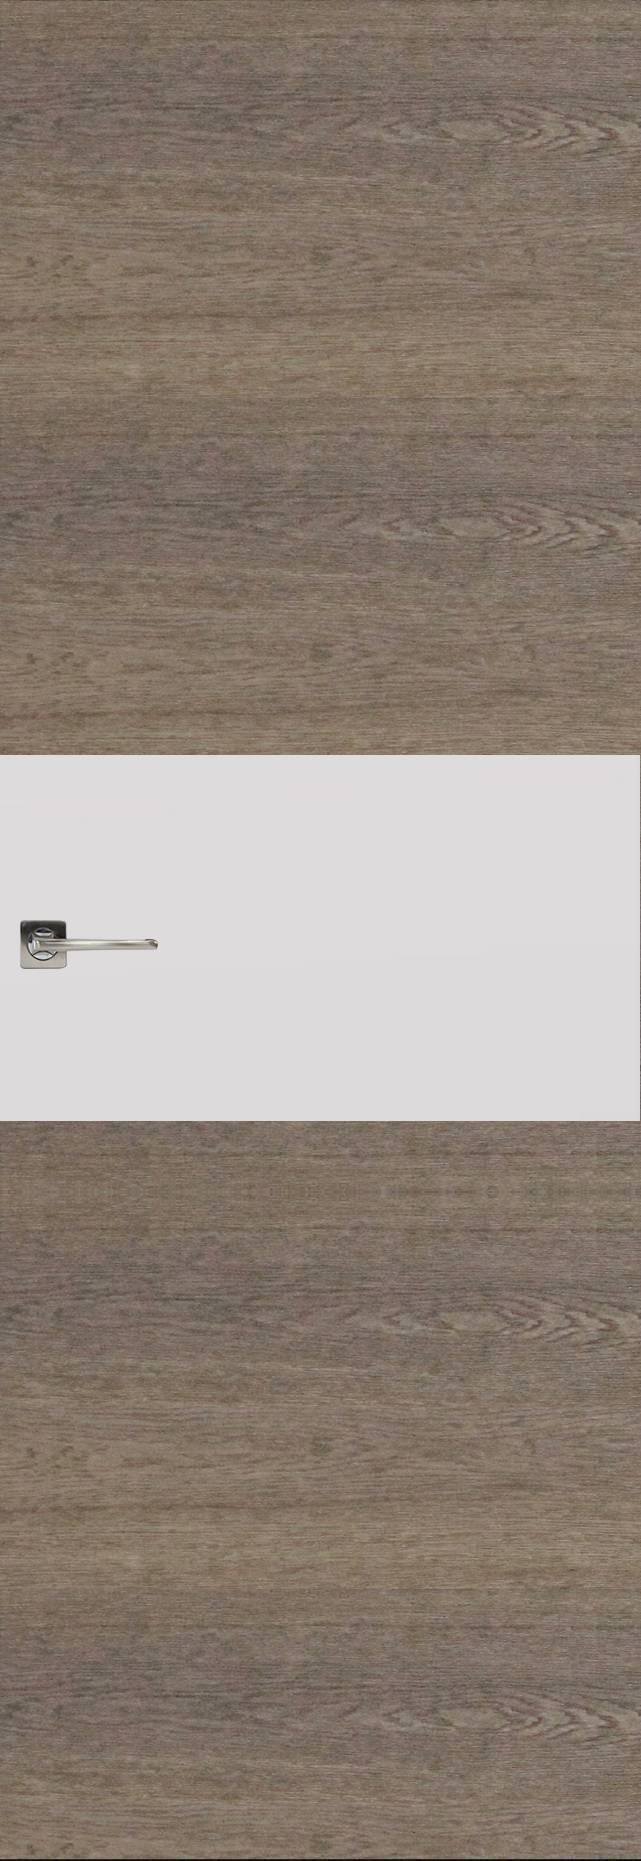 Tivoli Е-4 Невидимка цвет - Дуб антик Без стекла (ДГ)